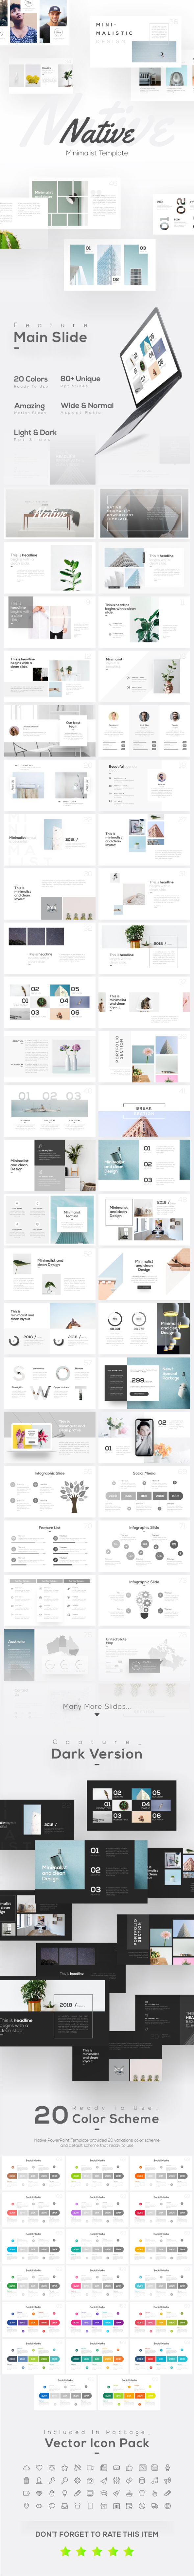 Native Minimalist PowerPoint Template - Business PowerPoint Templates